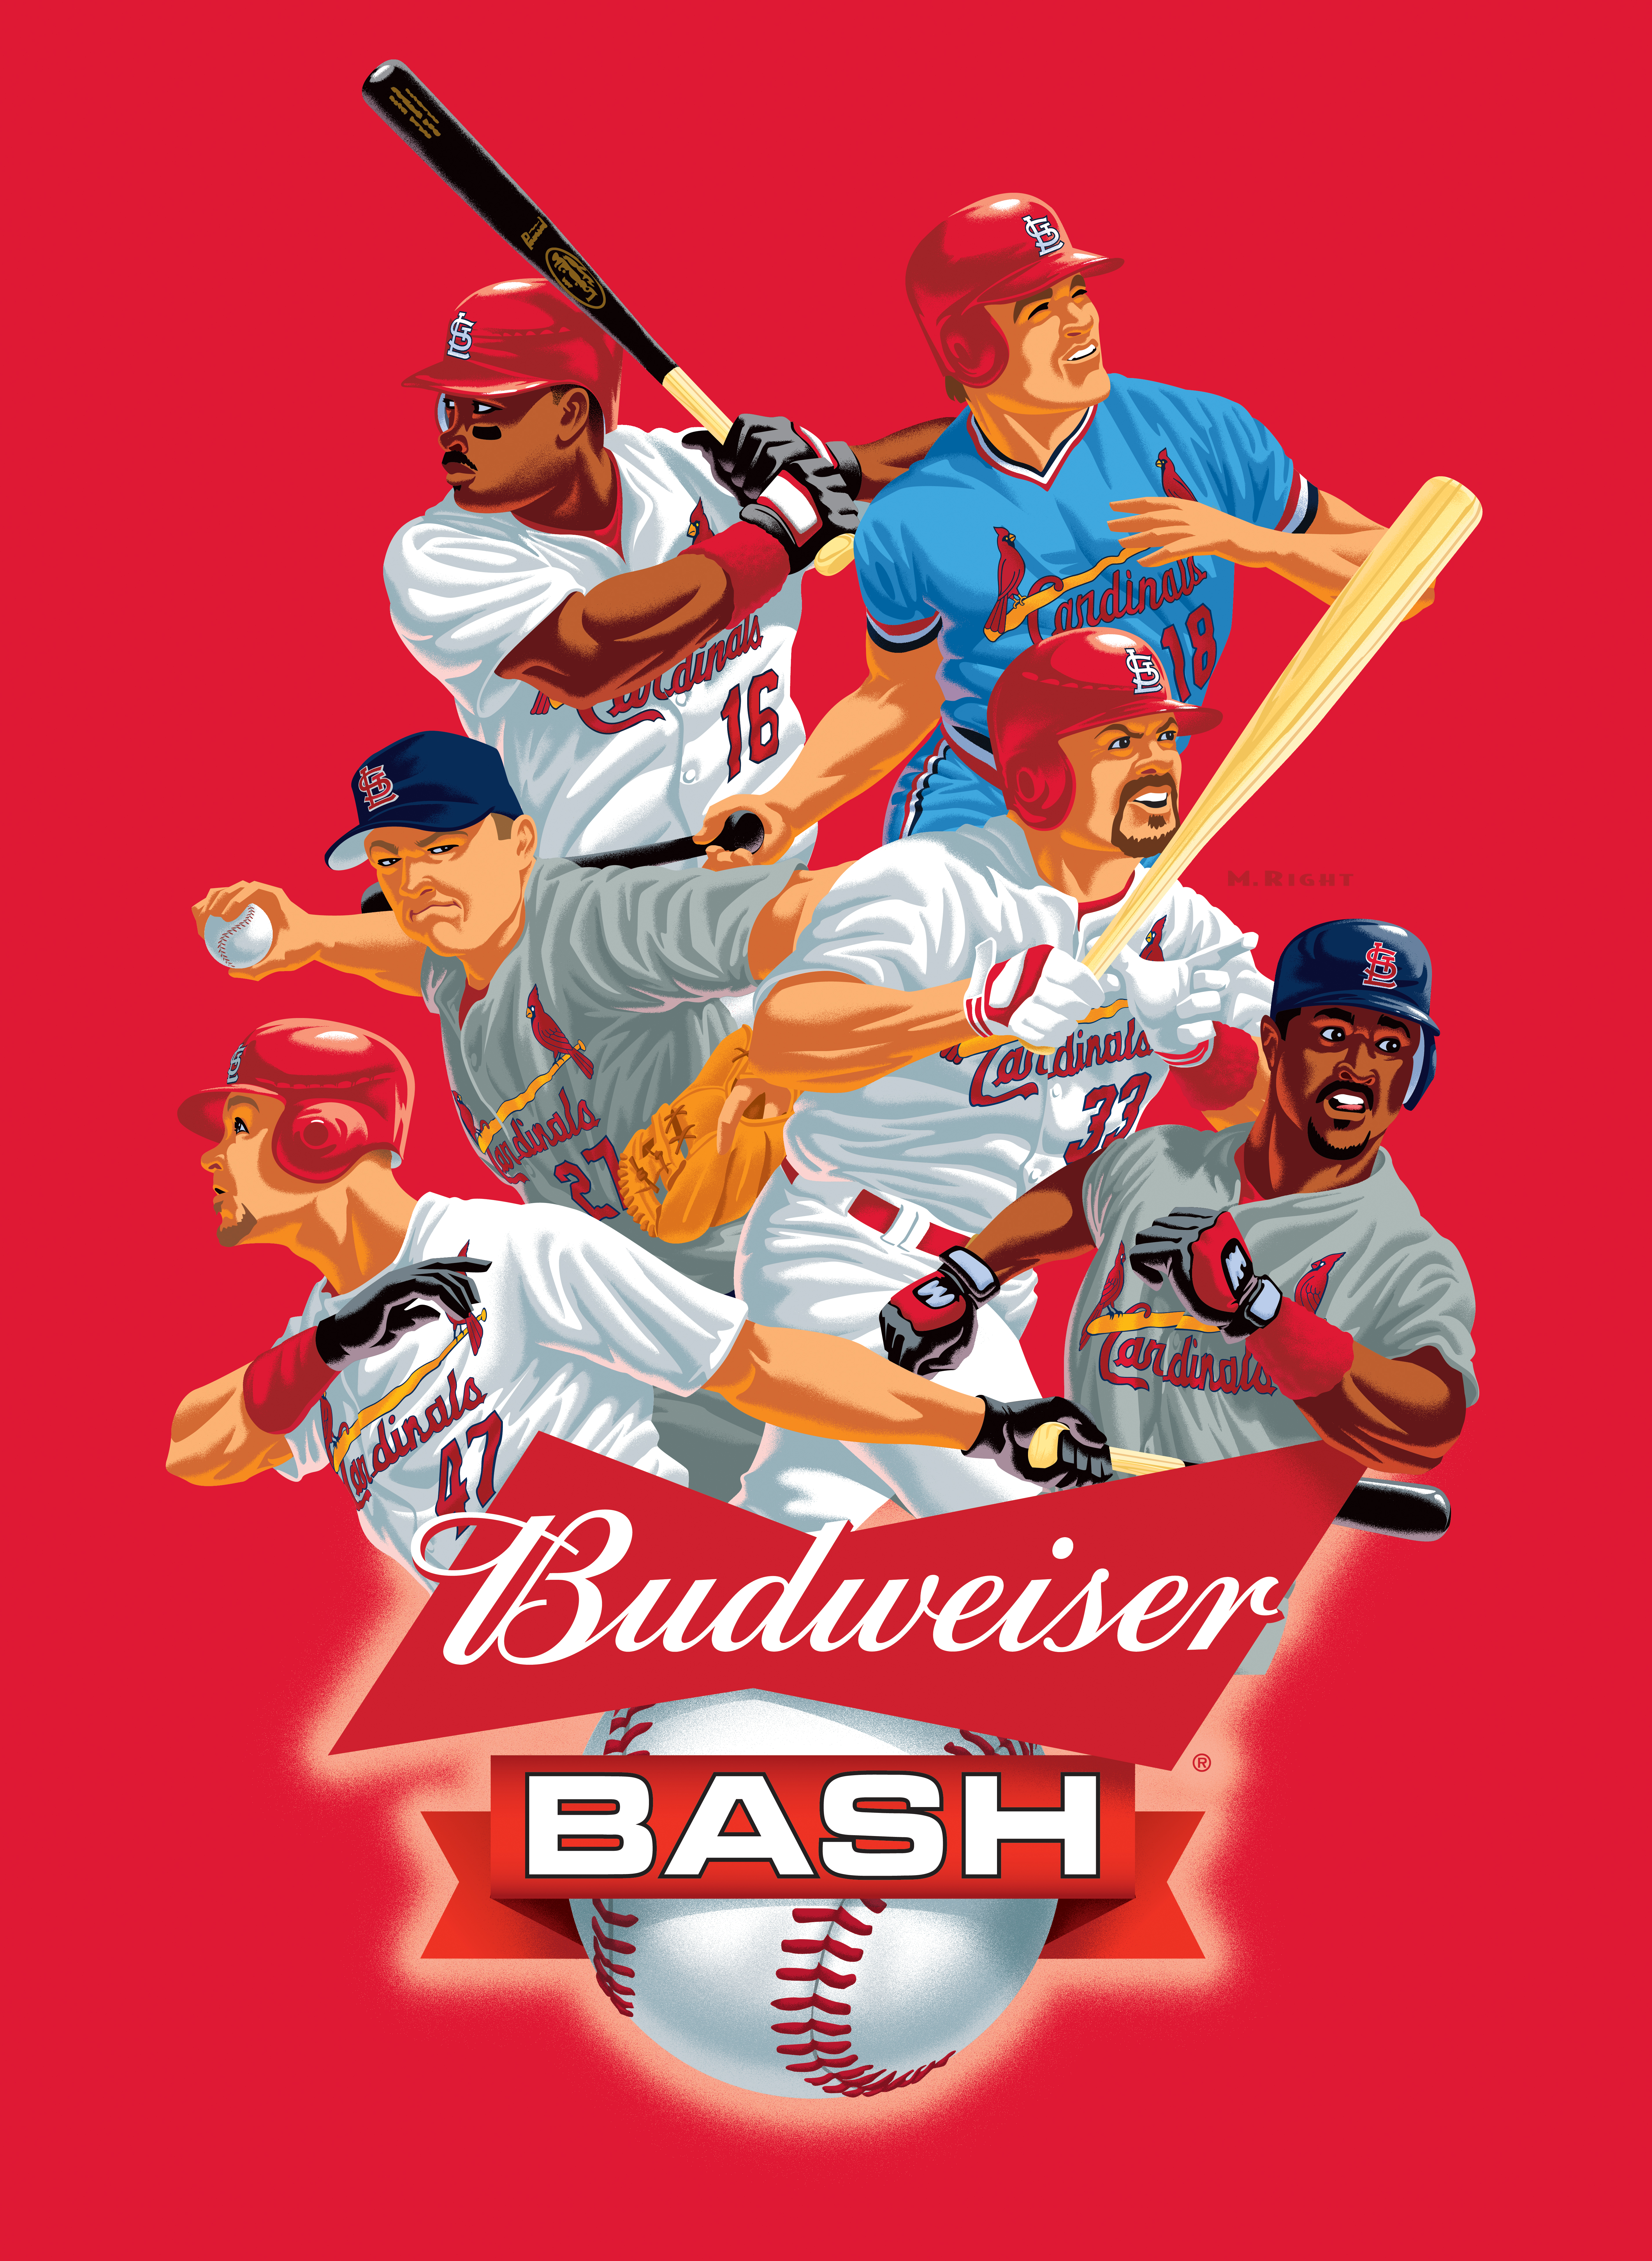 2018 Cardinal Budweiser Bash Banner